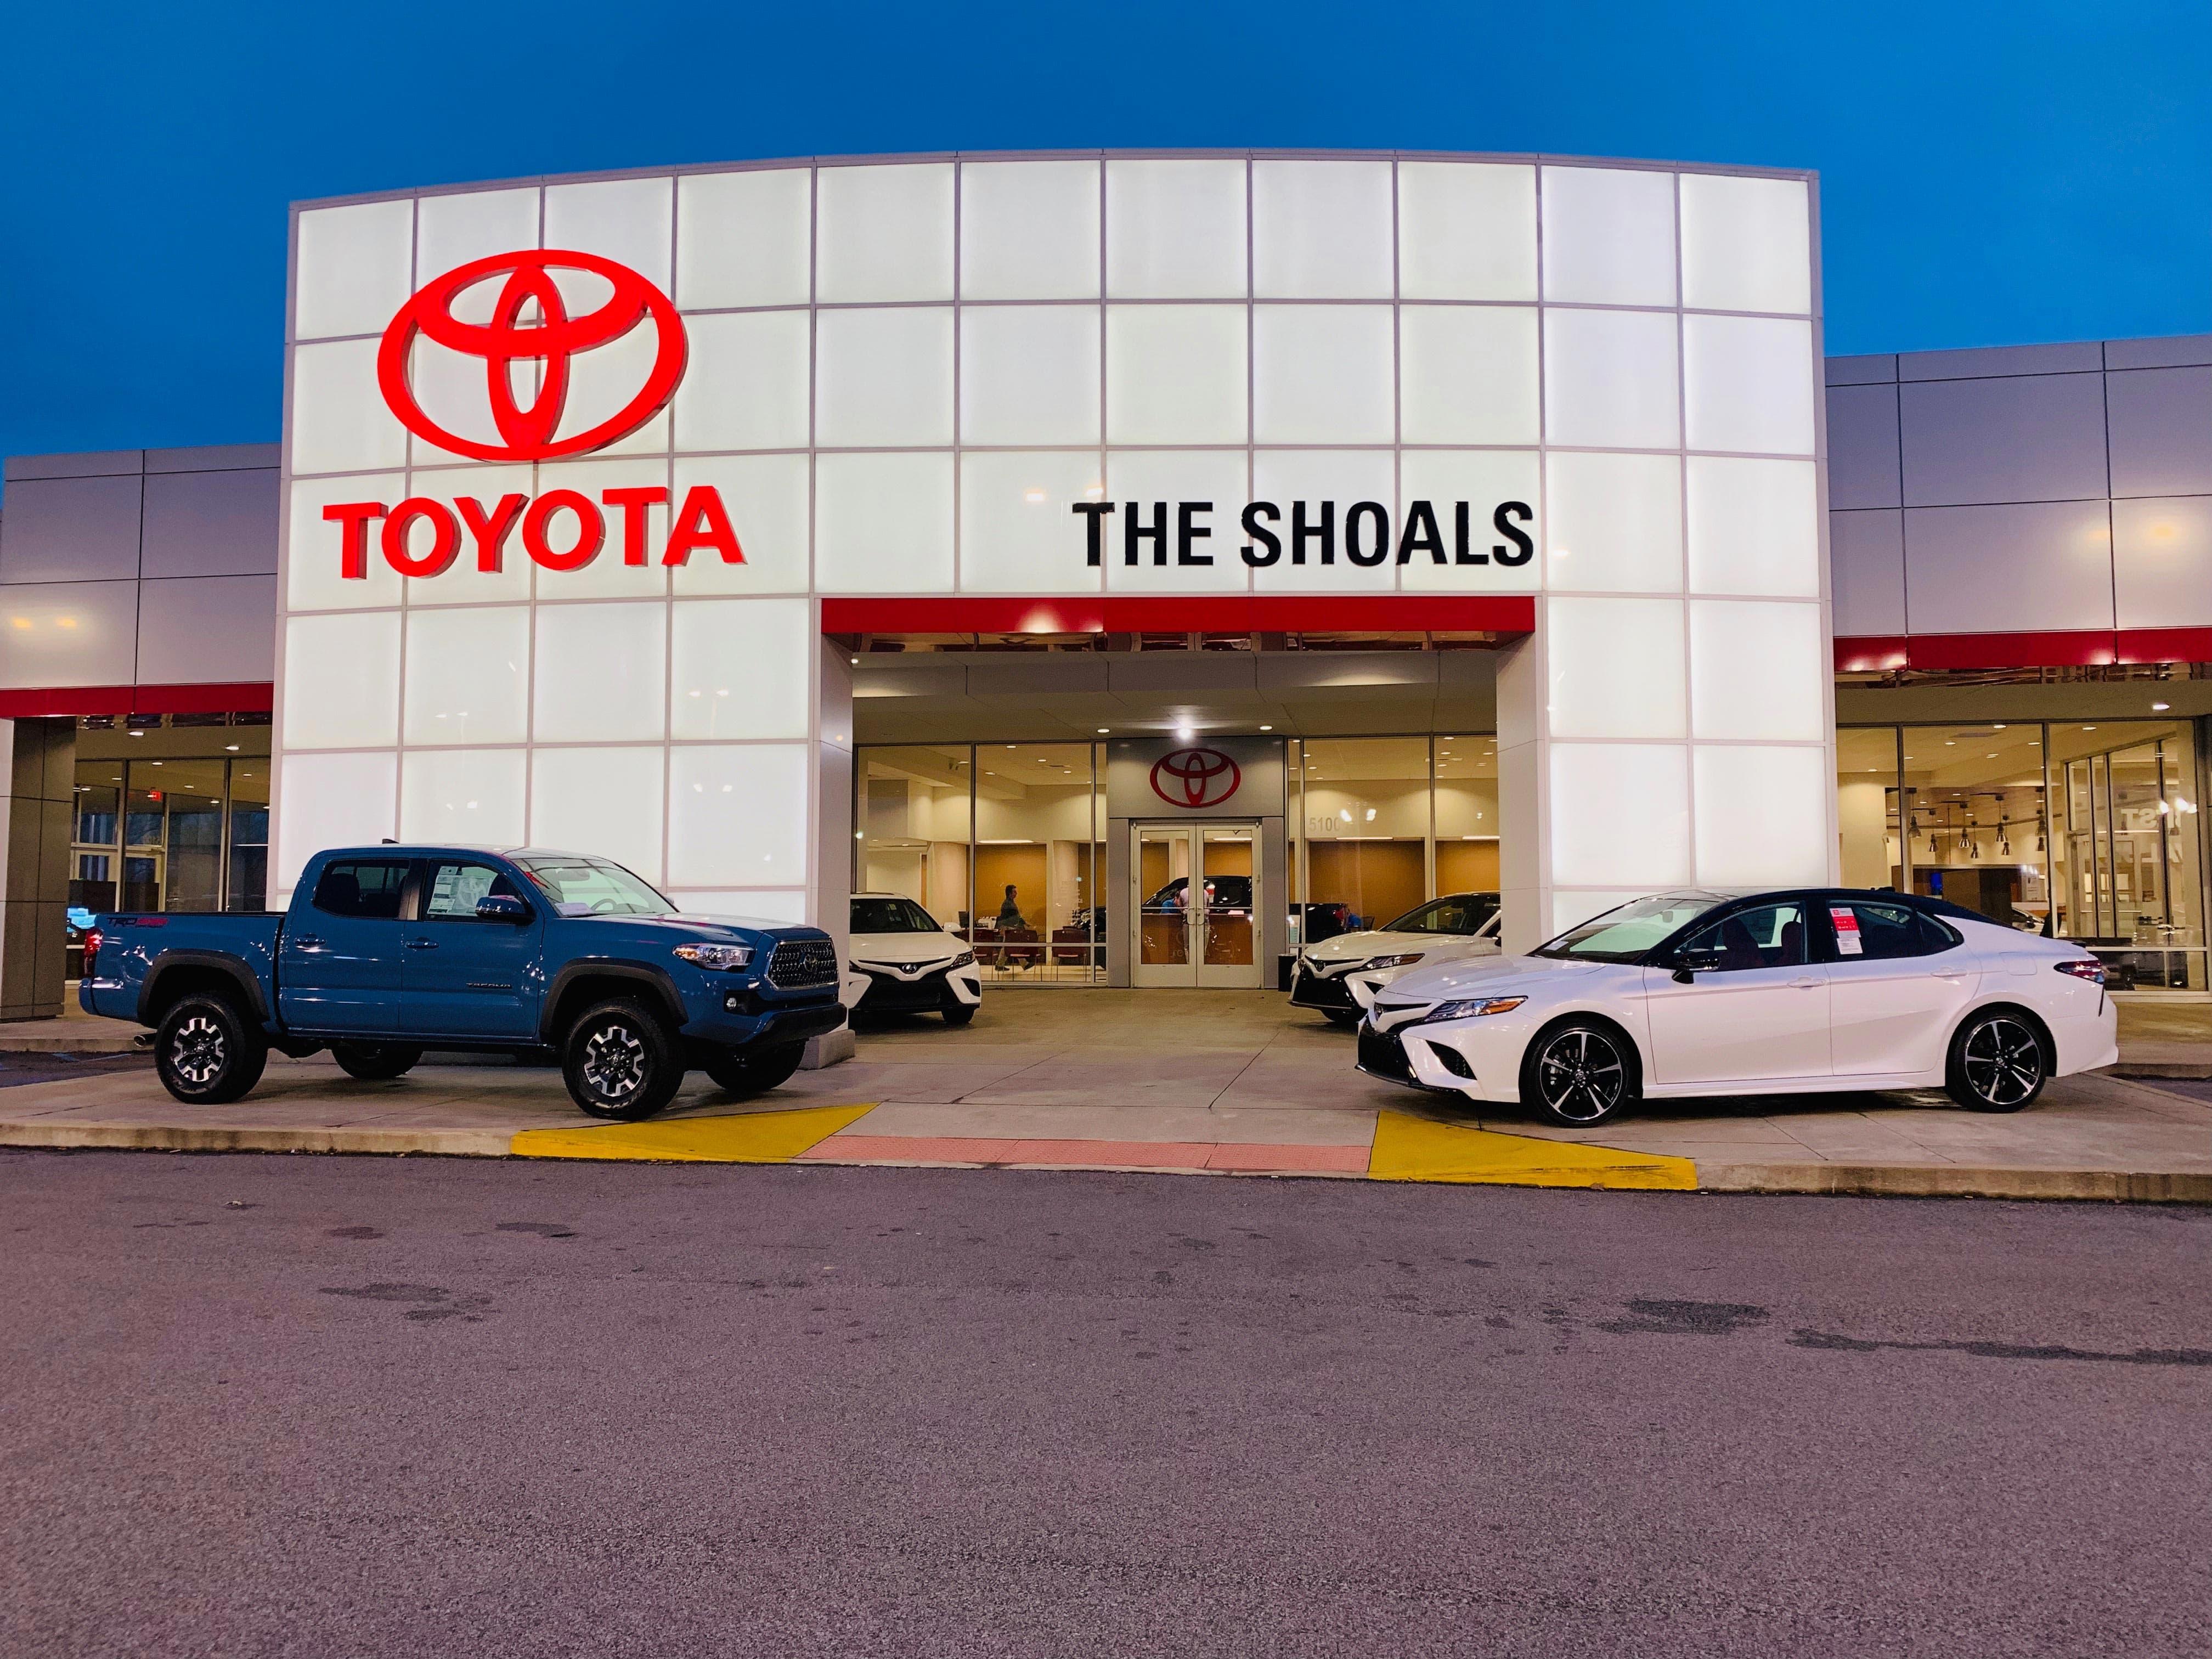 Car Dealerships In Jackson Ms >> Toyota Dealership Jackson Ms Best Upcoming Car Release 2020